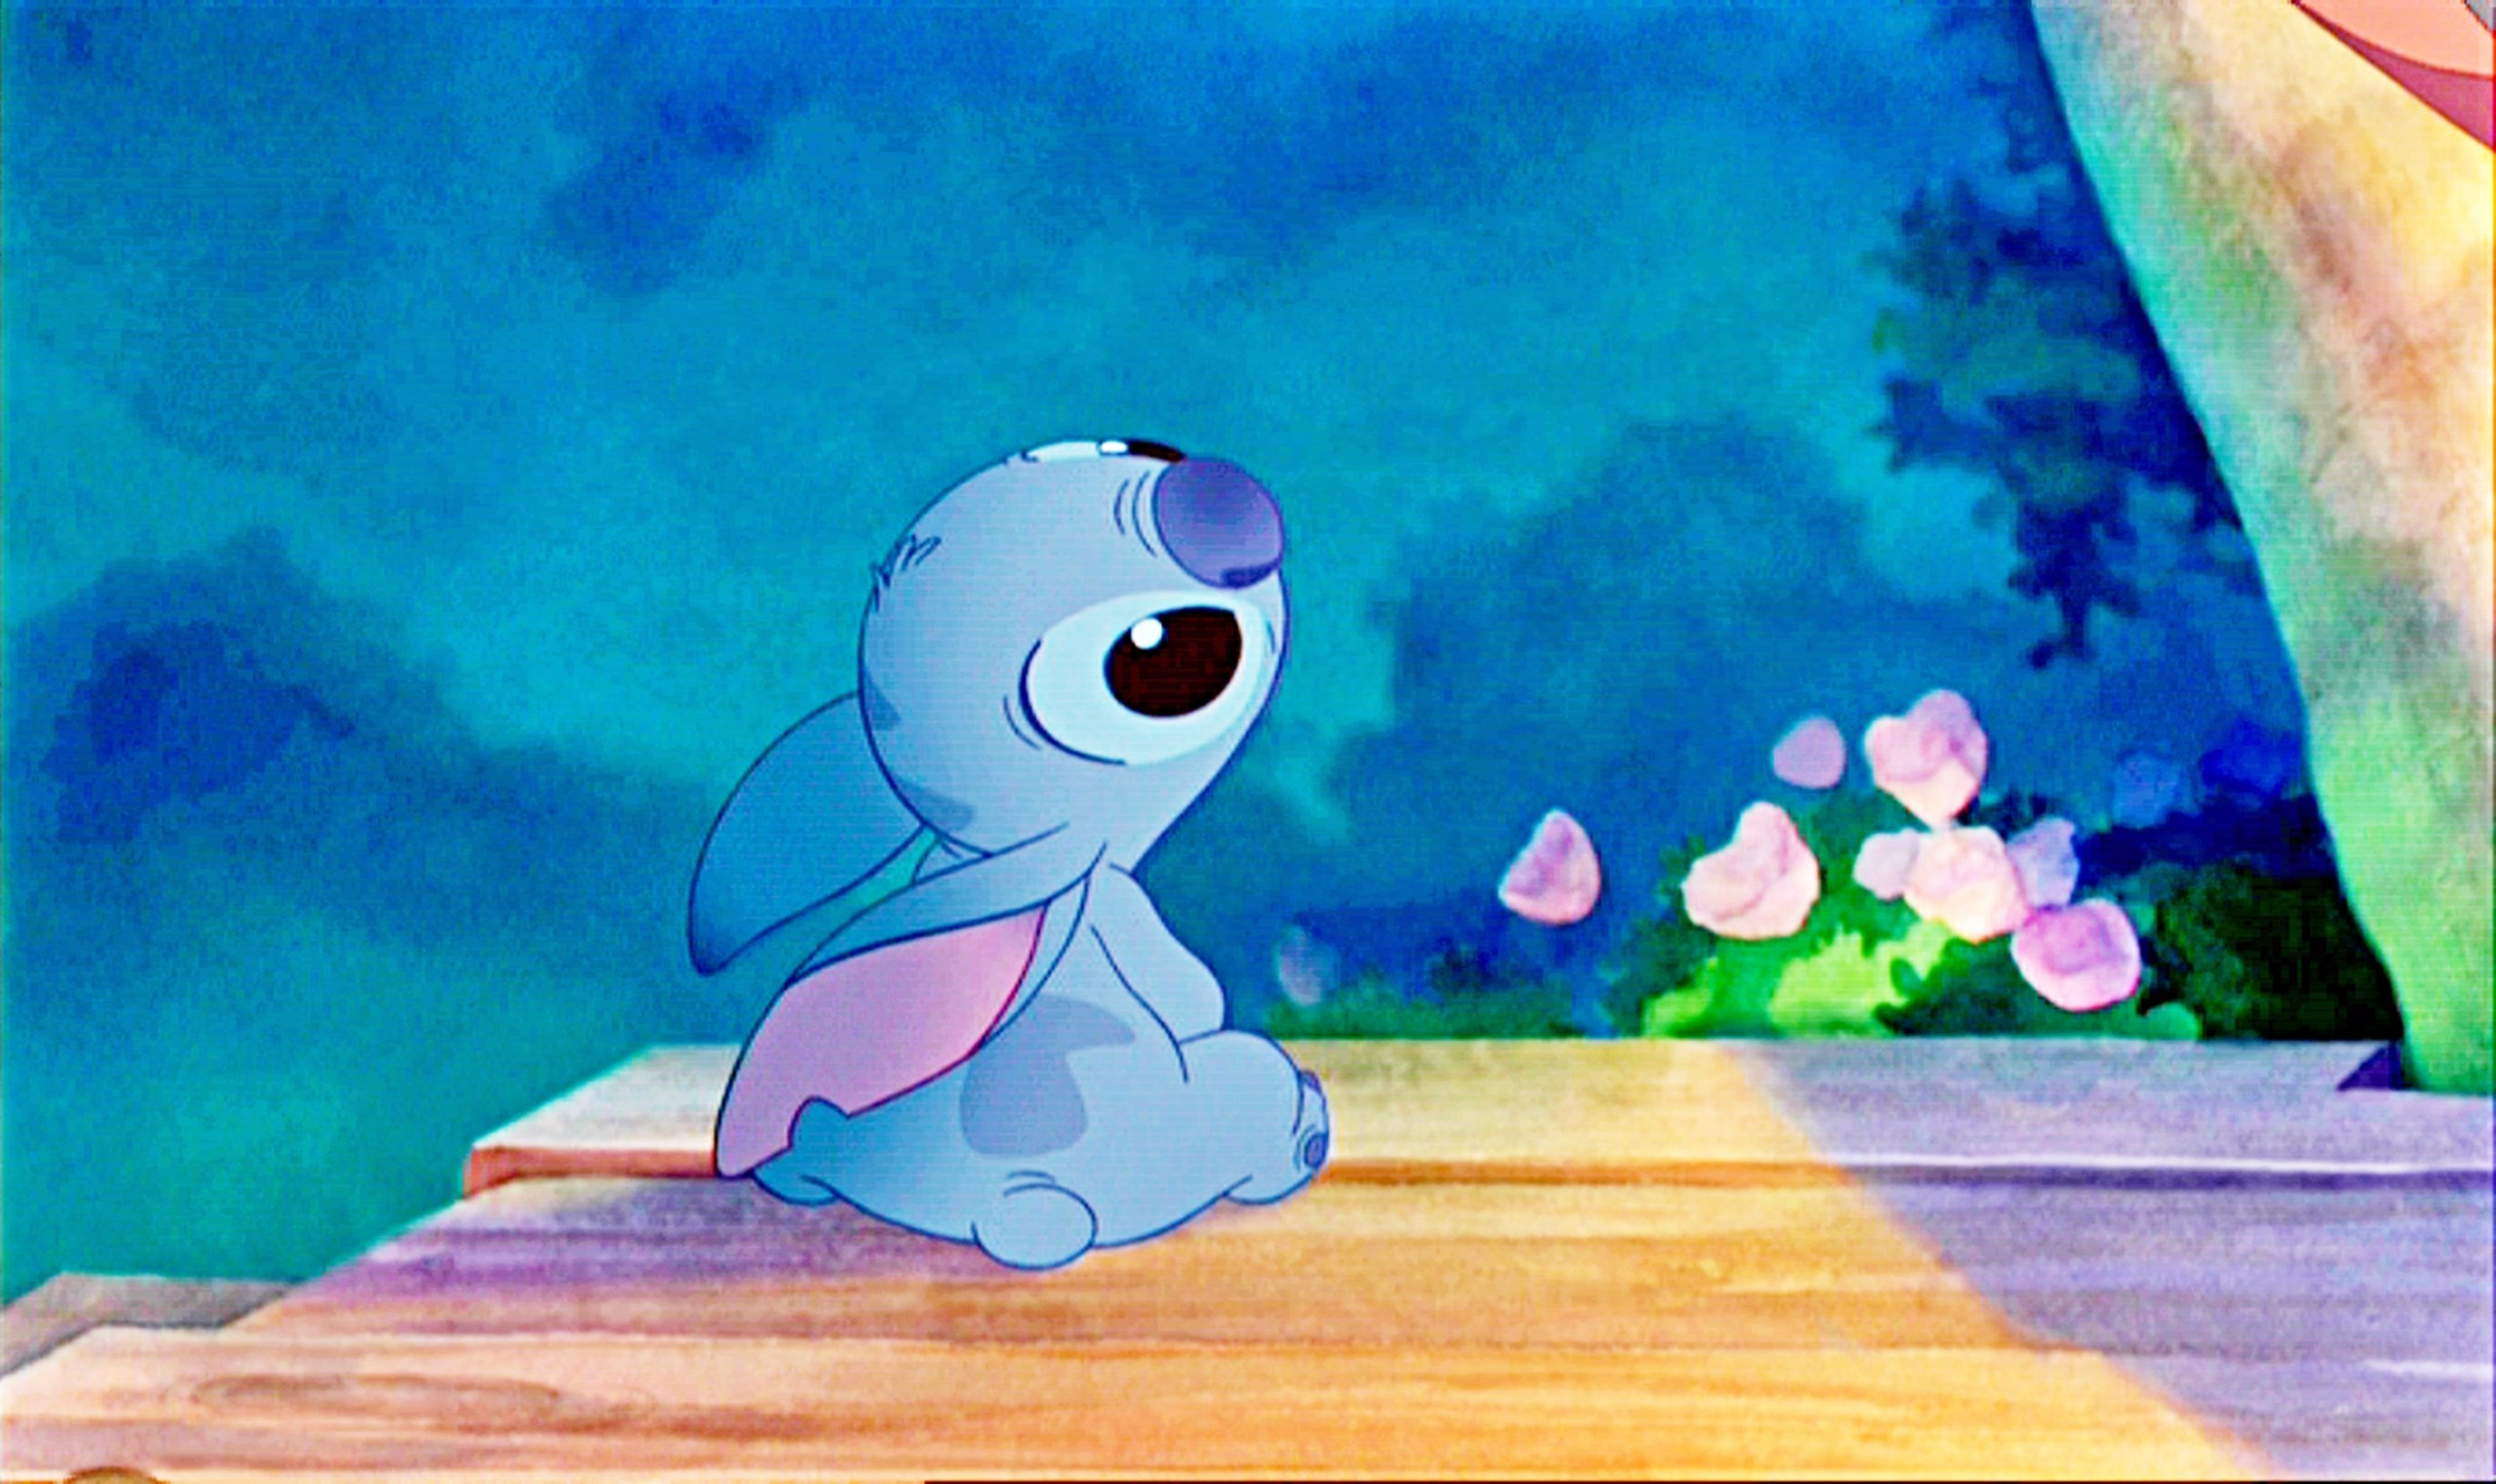 2560x1522 Walt Disney Screencaps Stitch Characters 28621209